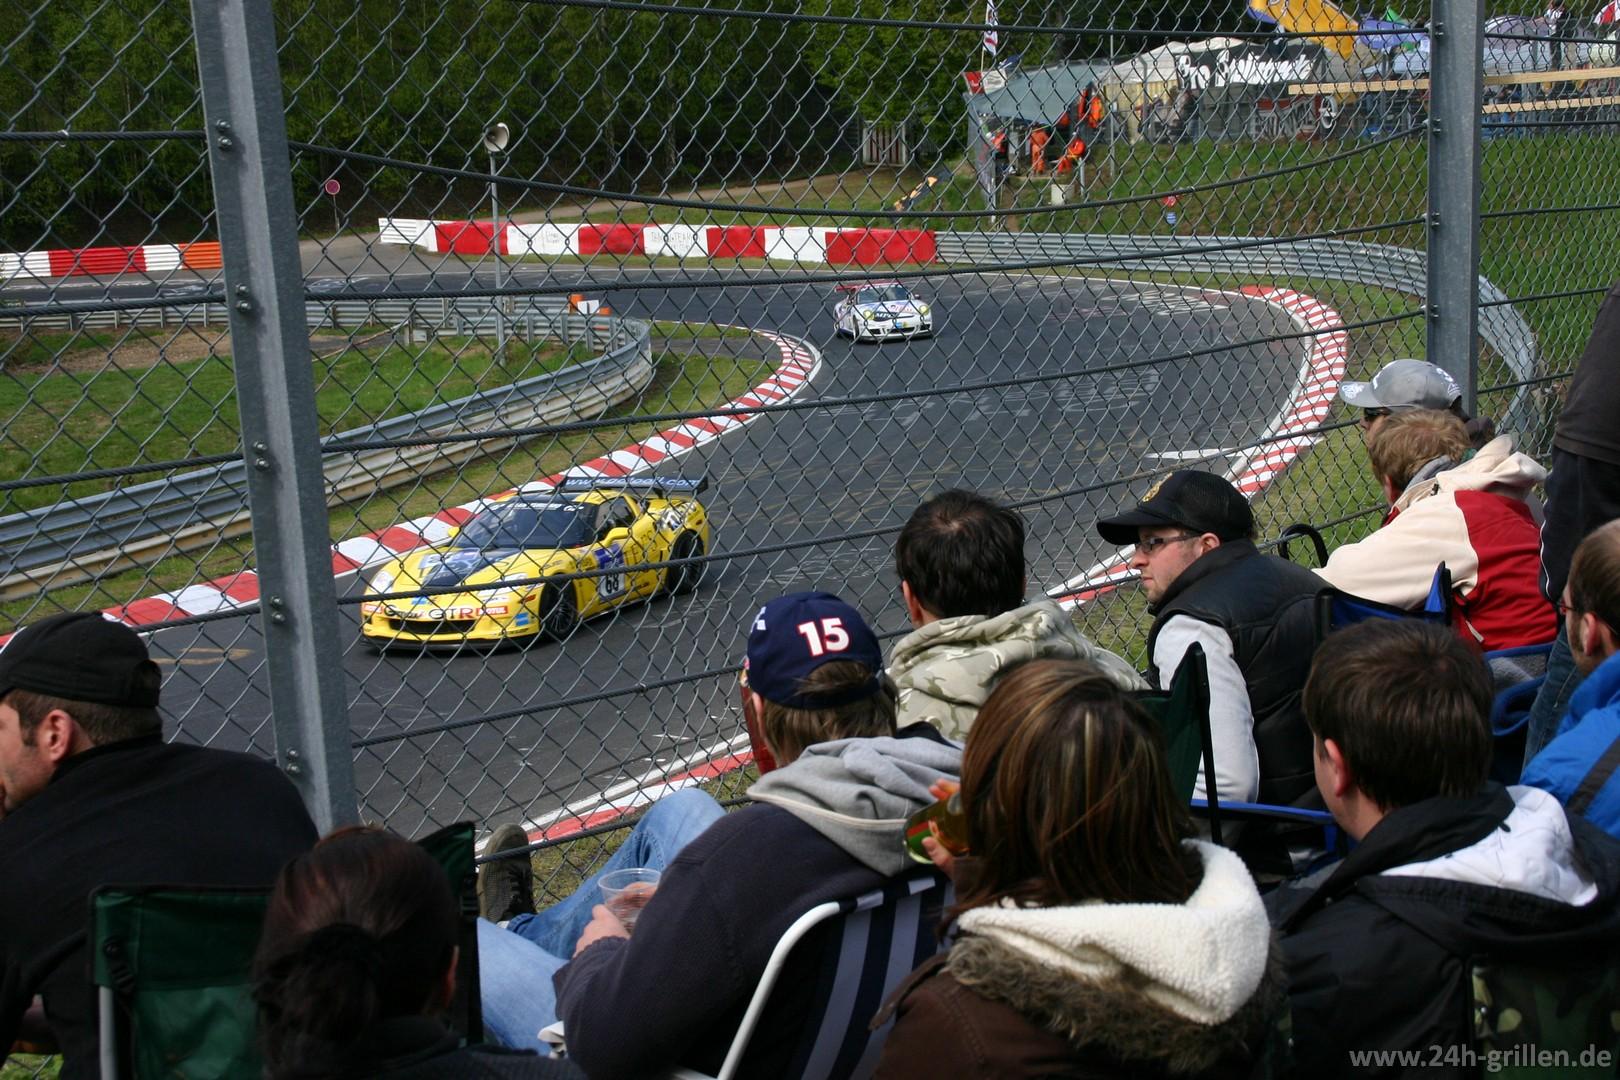 IMG_2010 (277)